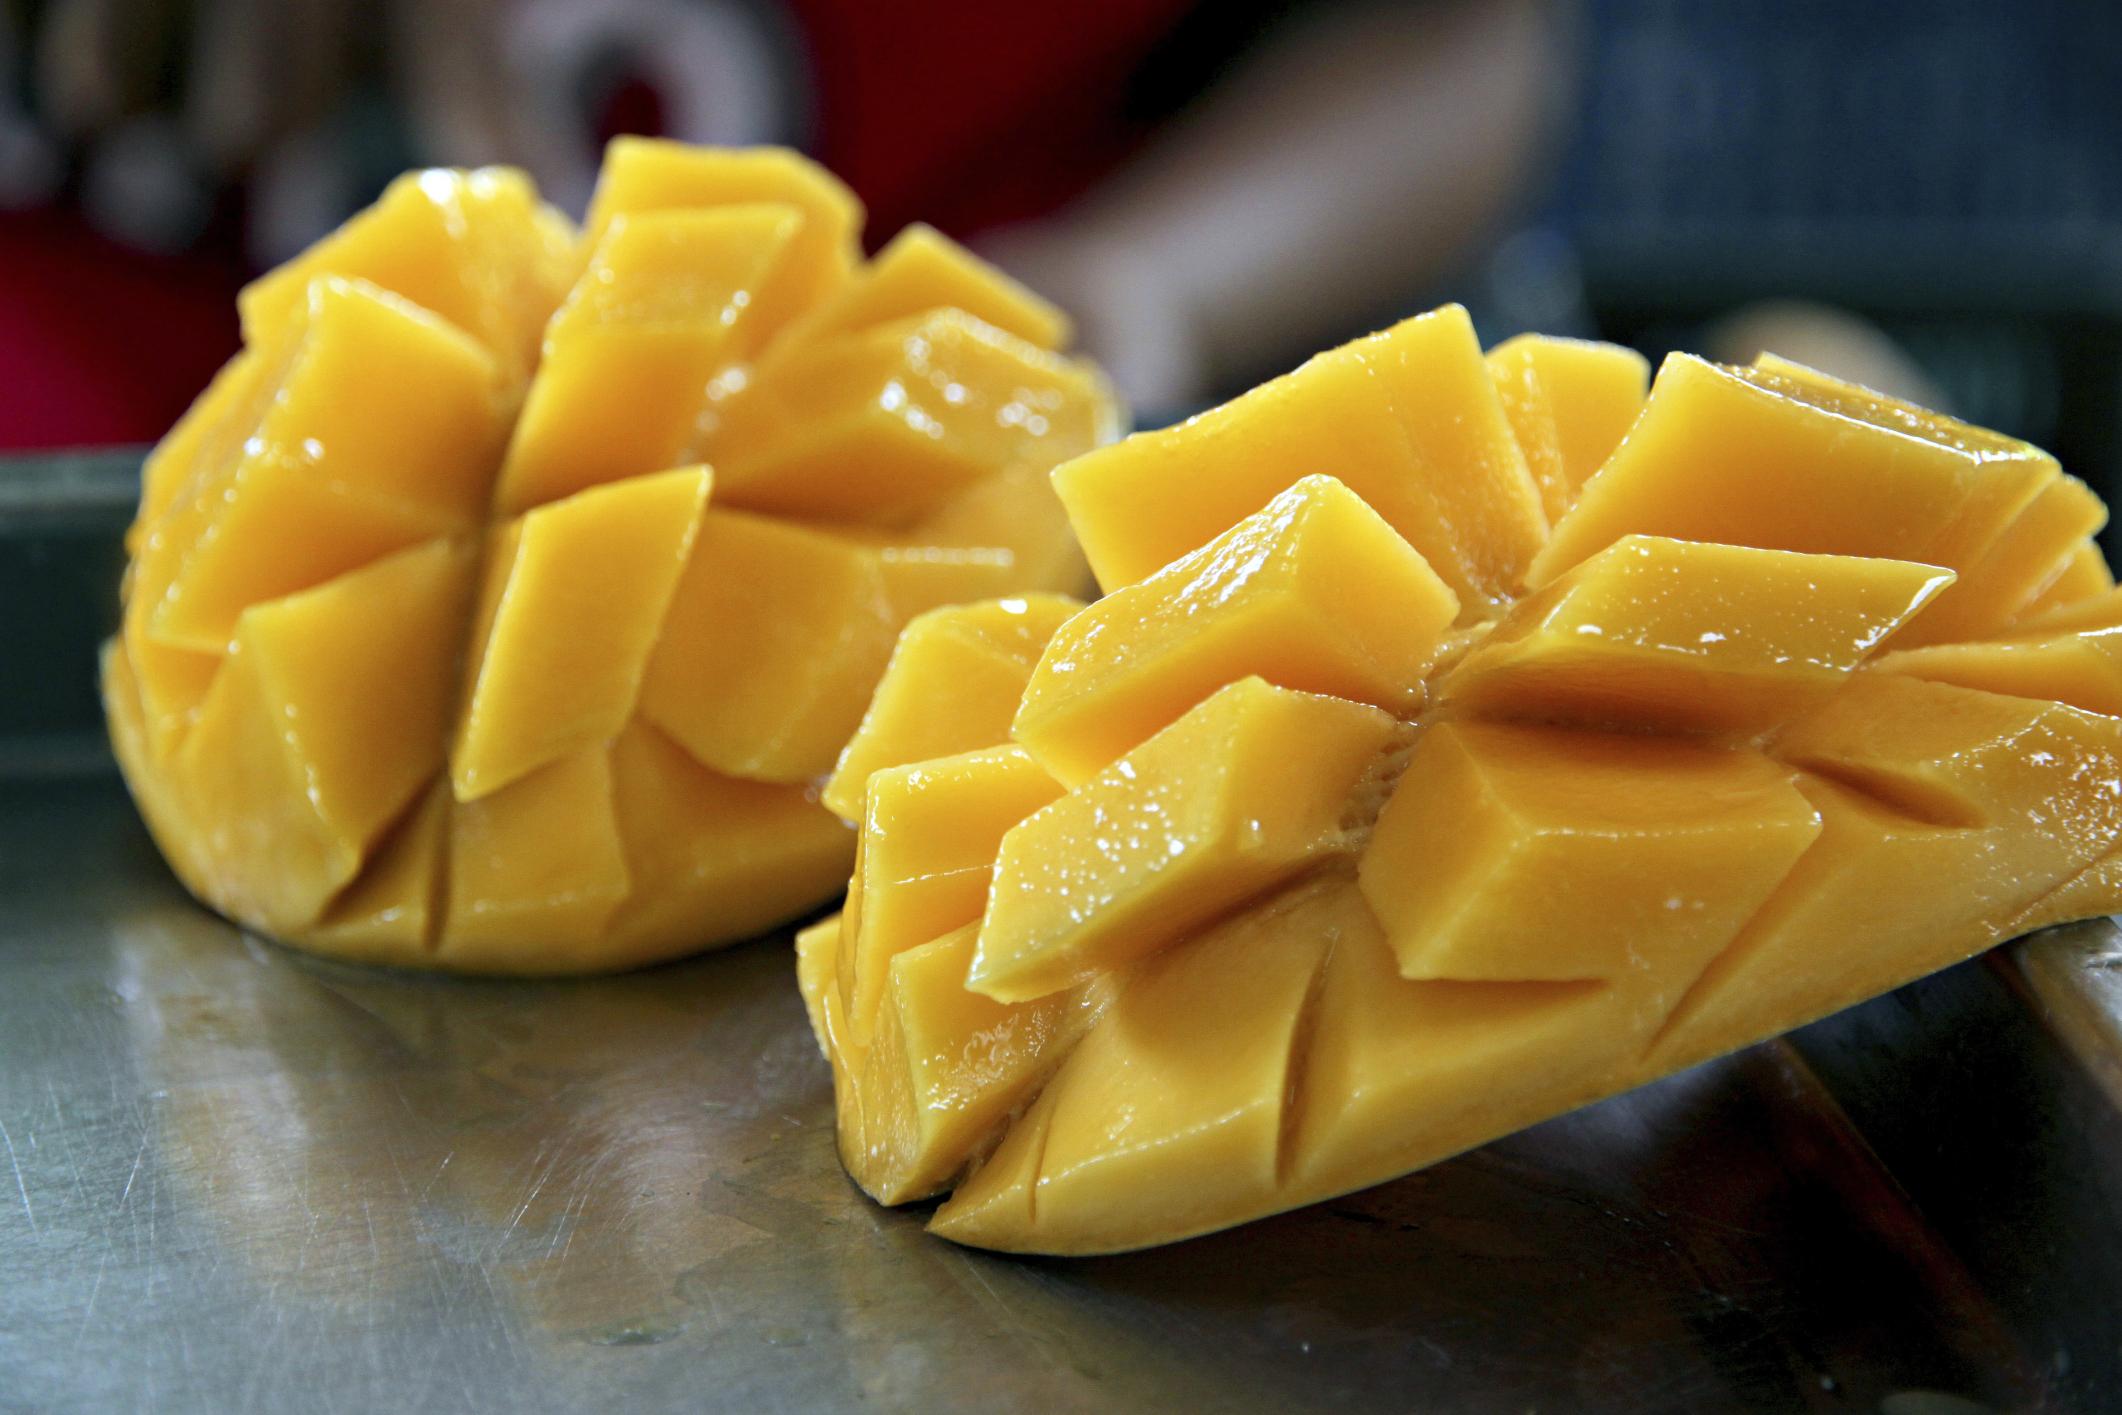 Mango: description, use. Nutritional value and calorie content of mango 39